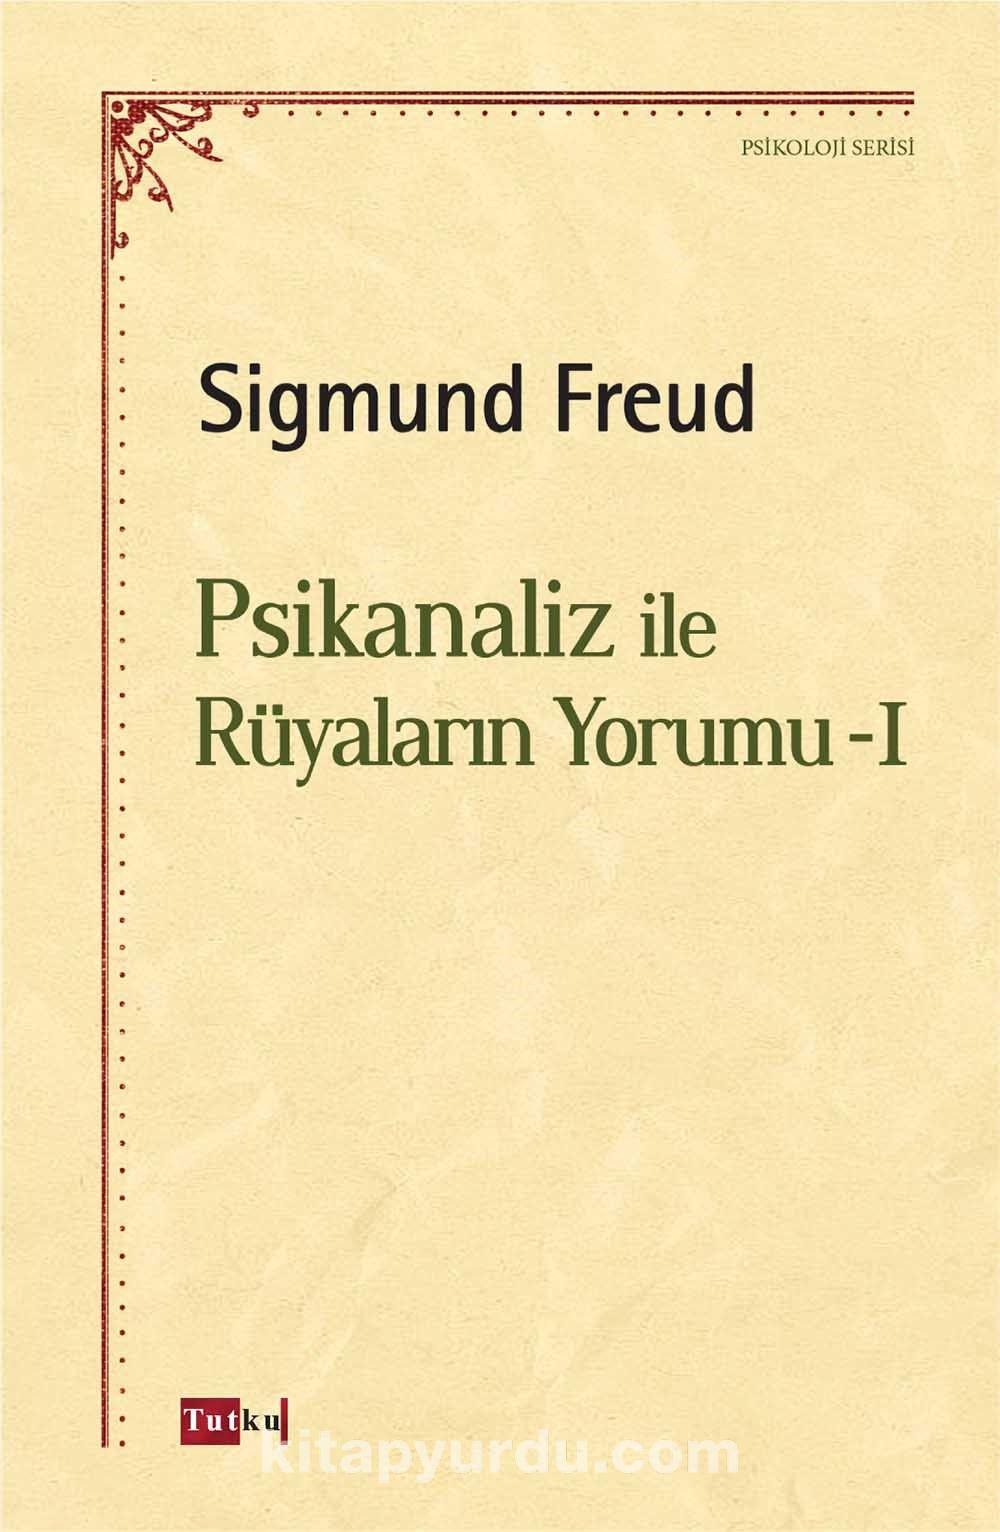 Psikanaliz ile Rüyaların Yorumu 1 - Sigmund Freud pdf epub